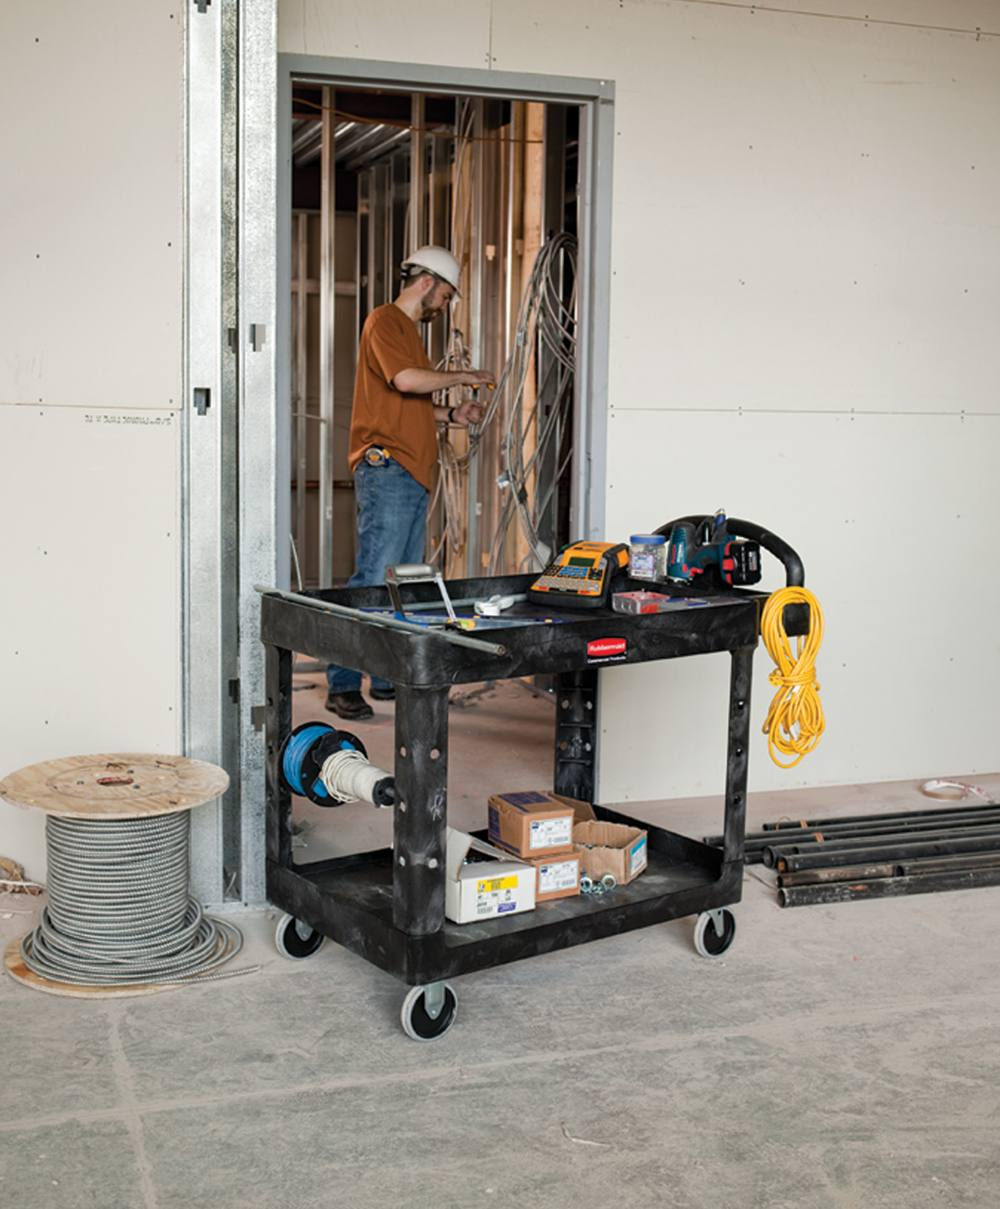 rubbermaid hd 2shelf utility cart - Rubbermaid Utility Cart